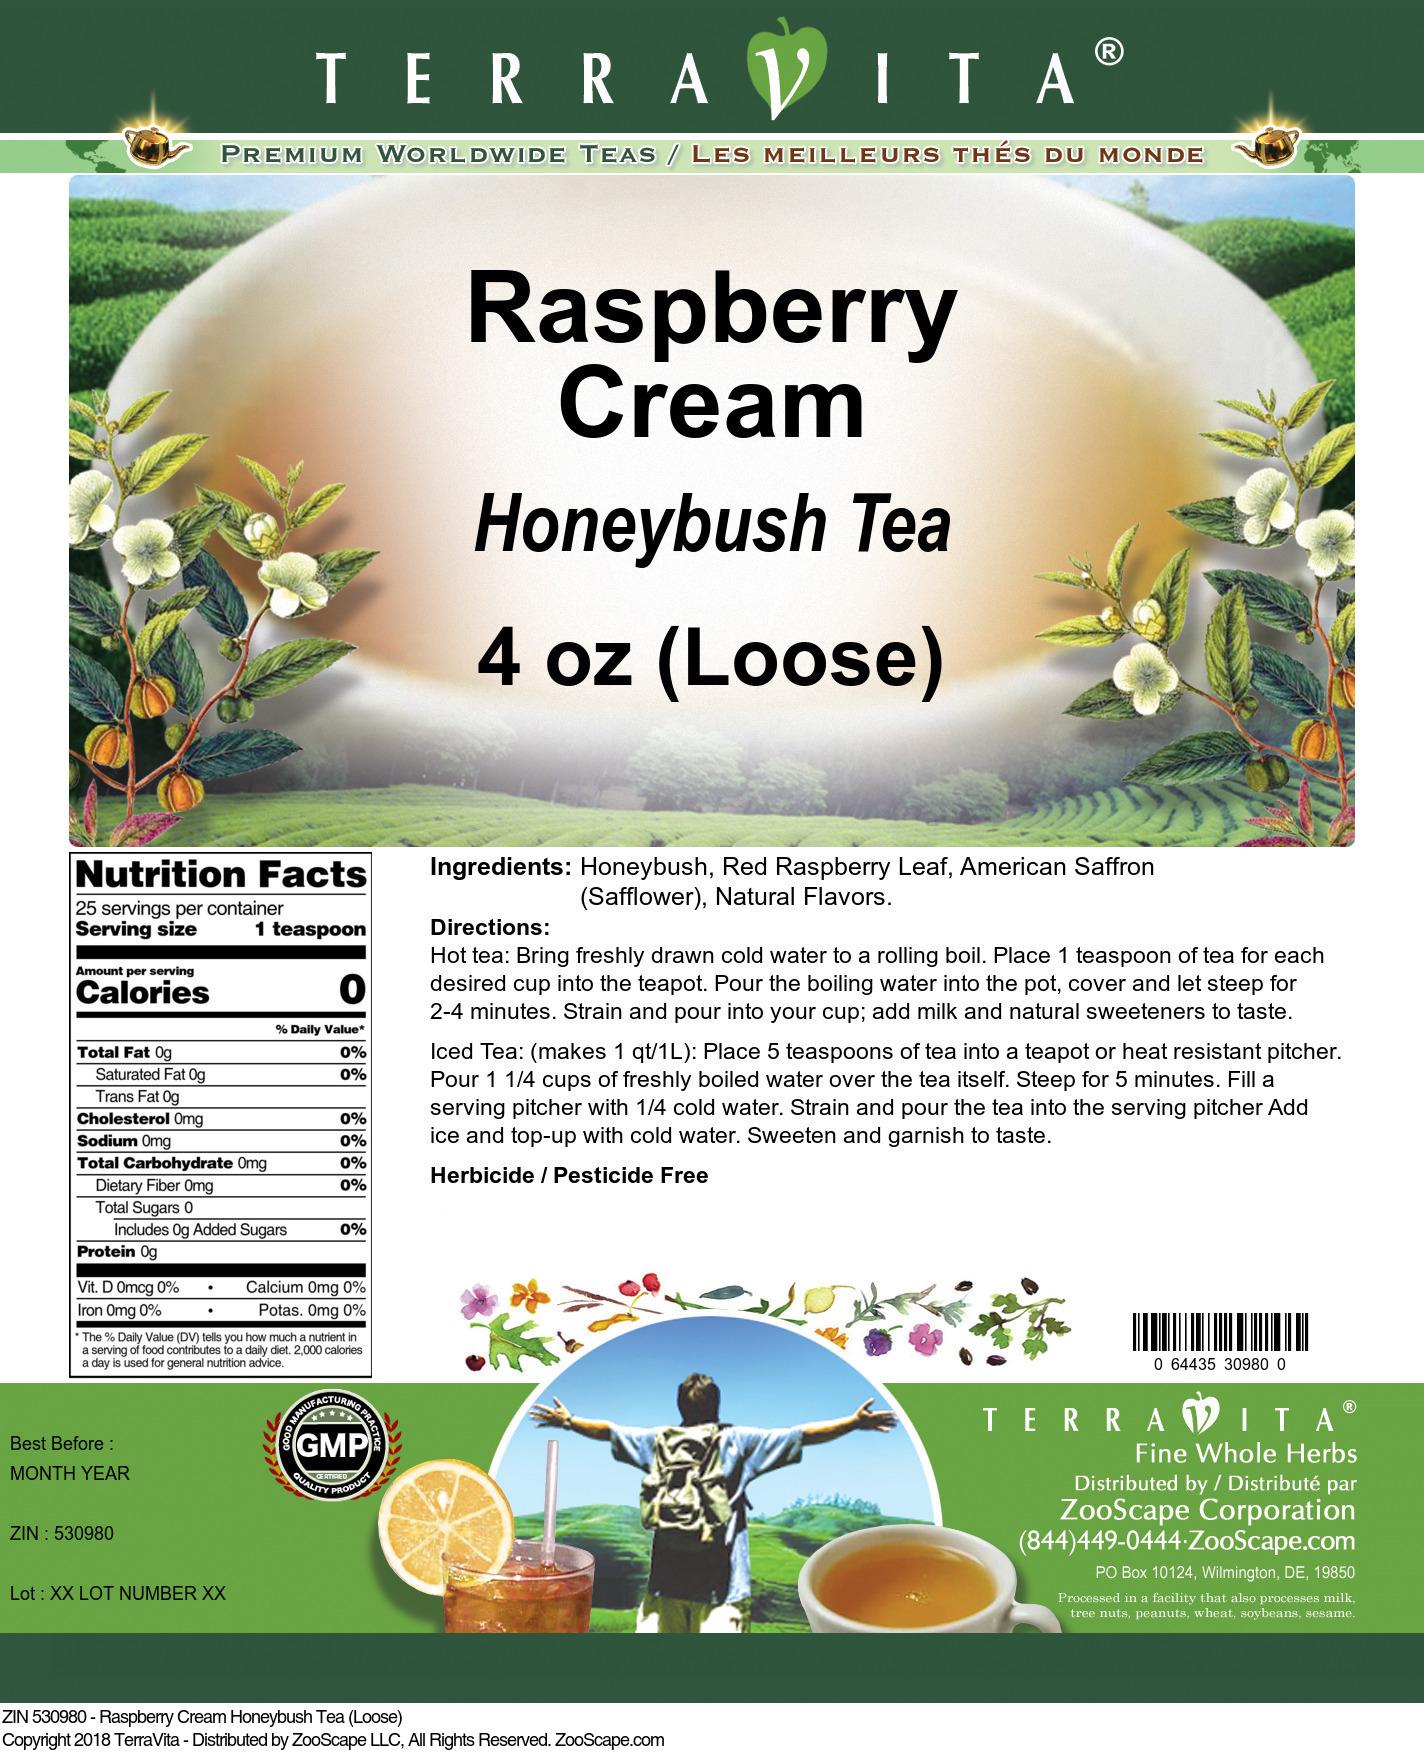 Raspberry Cream Honeybush Tea